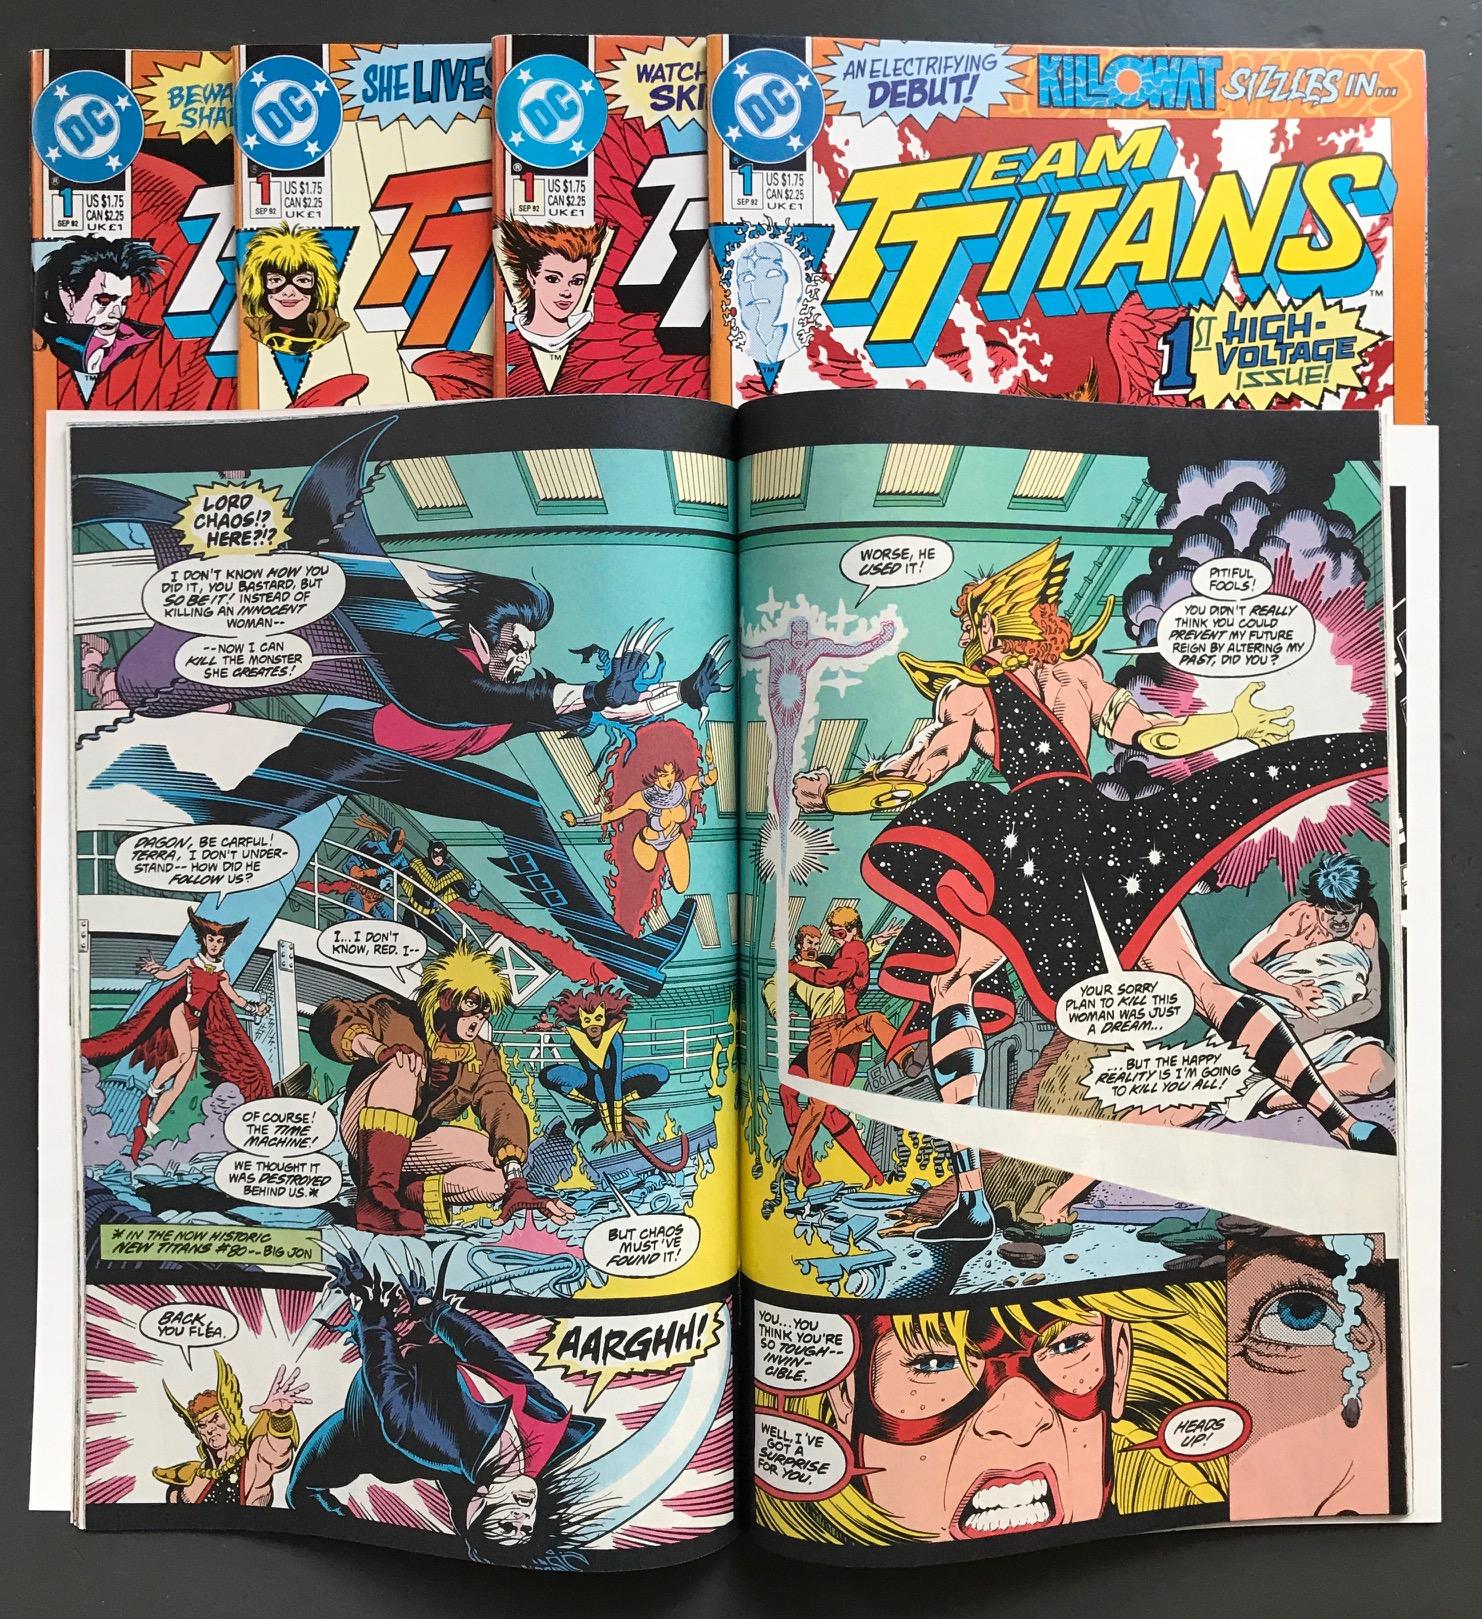 Michel Fiffe » OVERWORD 2 · Titans Fix Part Two